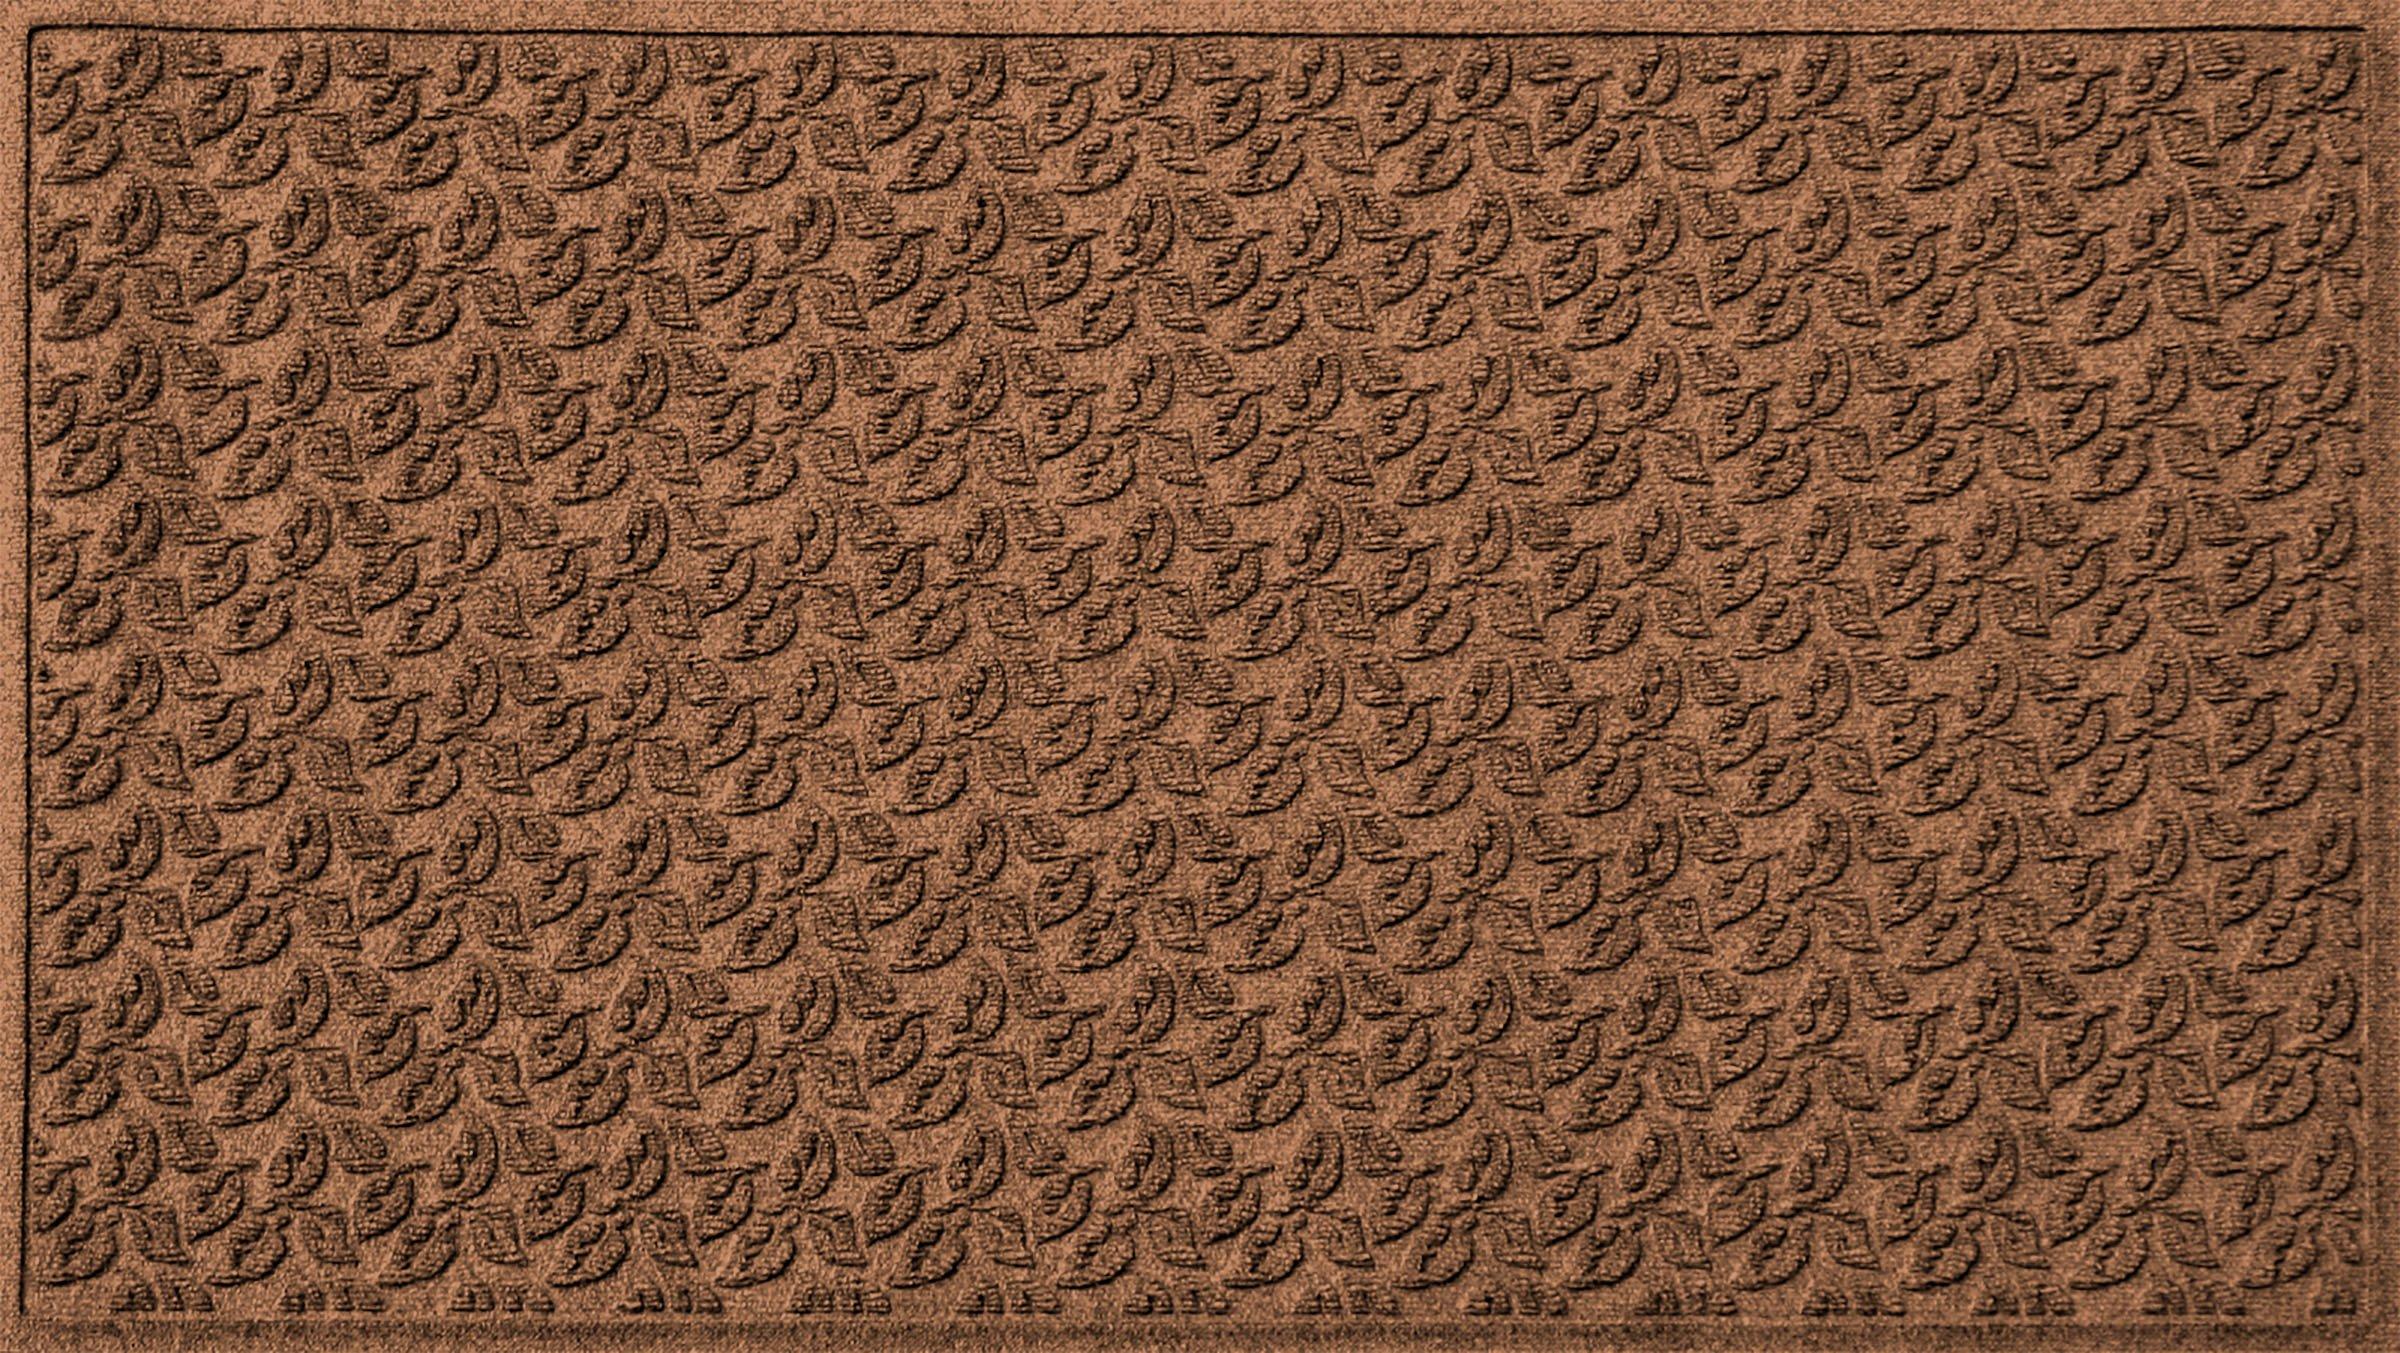 Bungalow Flooring Waterhog Doormat, 3' x 5', Skid Resistant, Easy to Clean, Catches Water and Debris, Dogwood Leaf Collection, Dark Brown